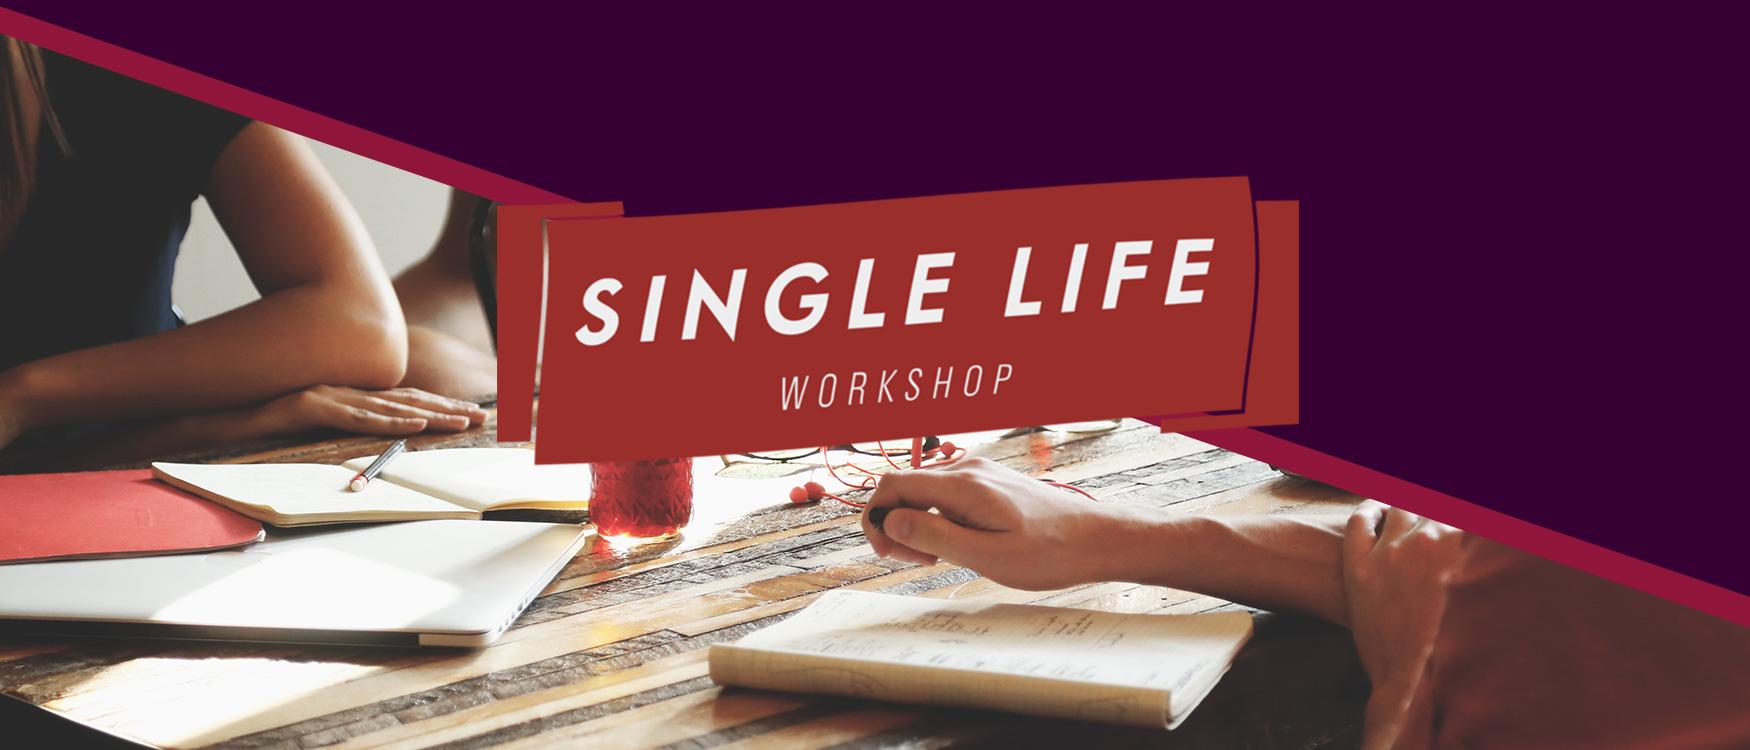 Single life workshop header.jpg